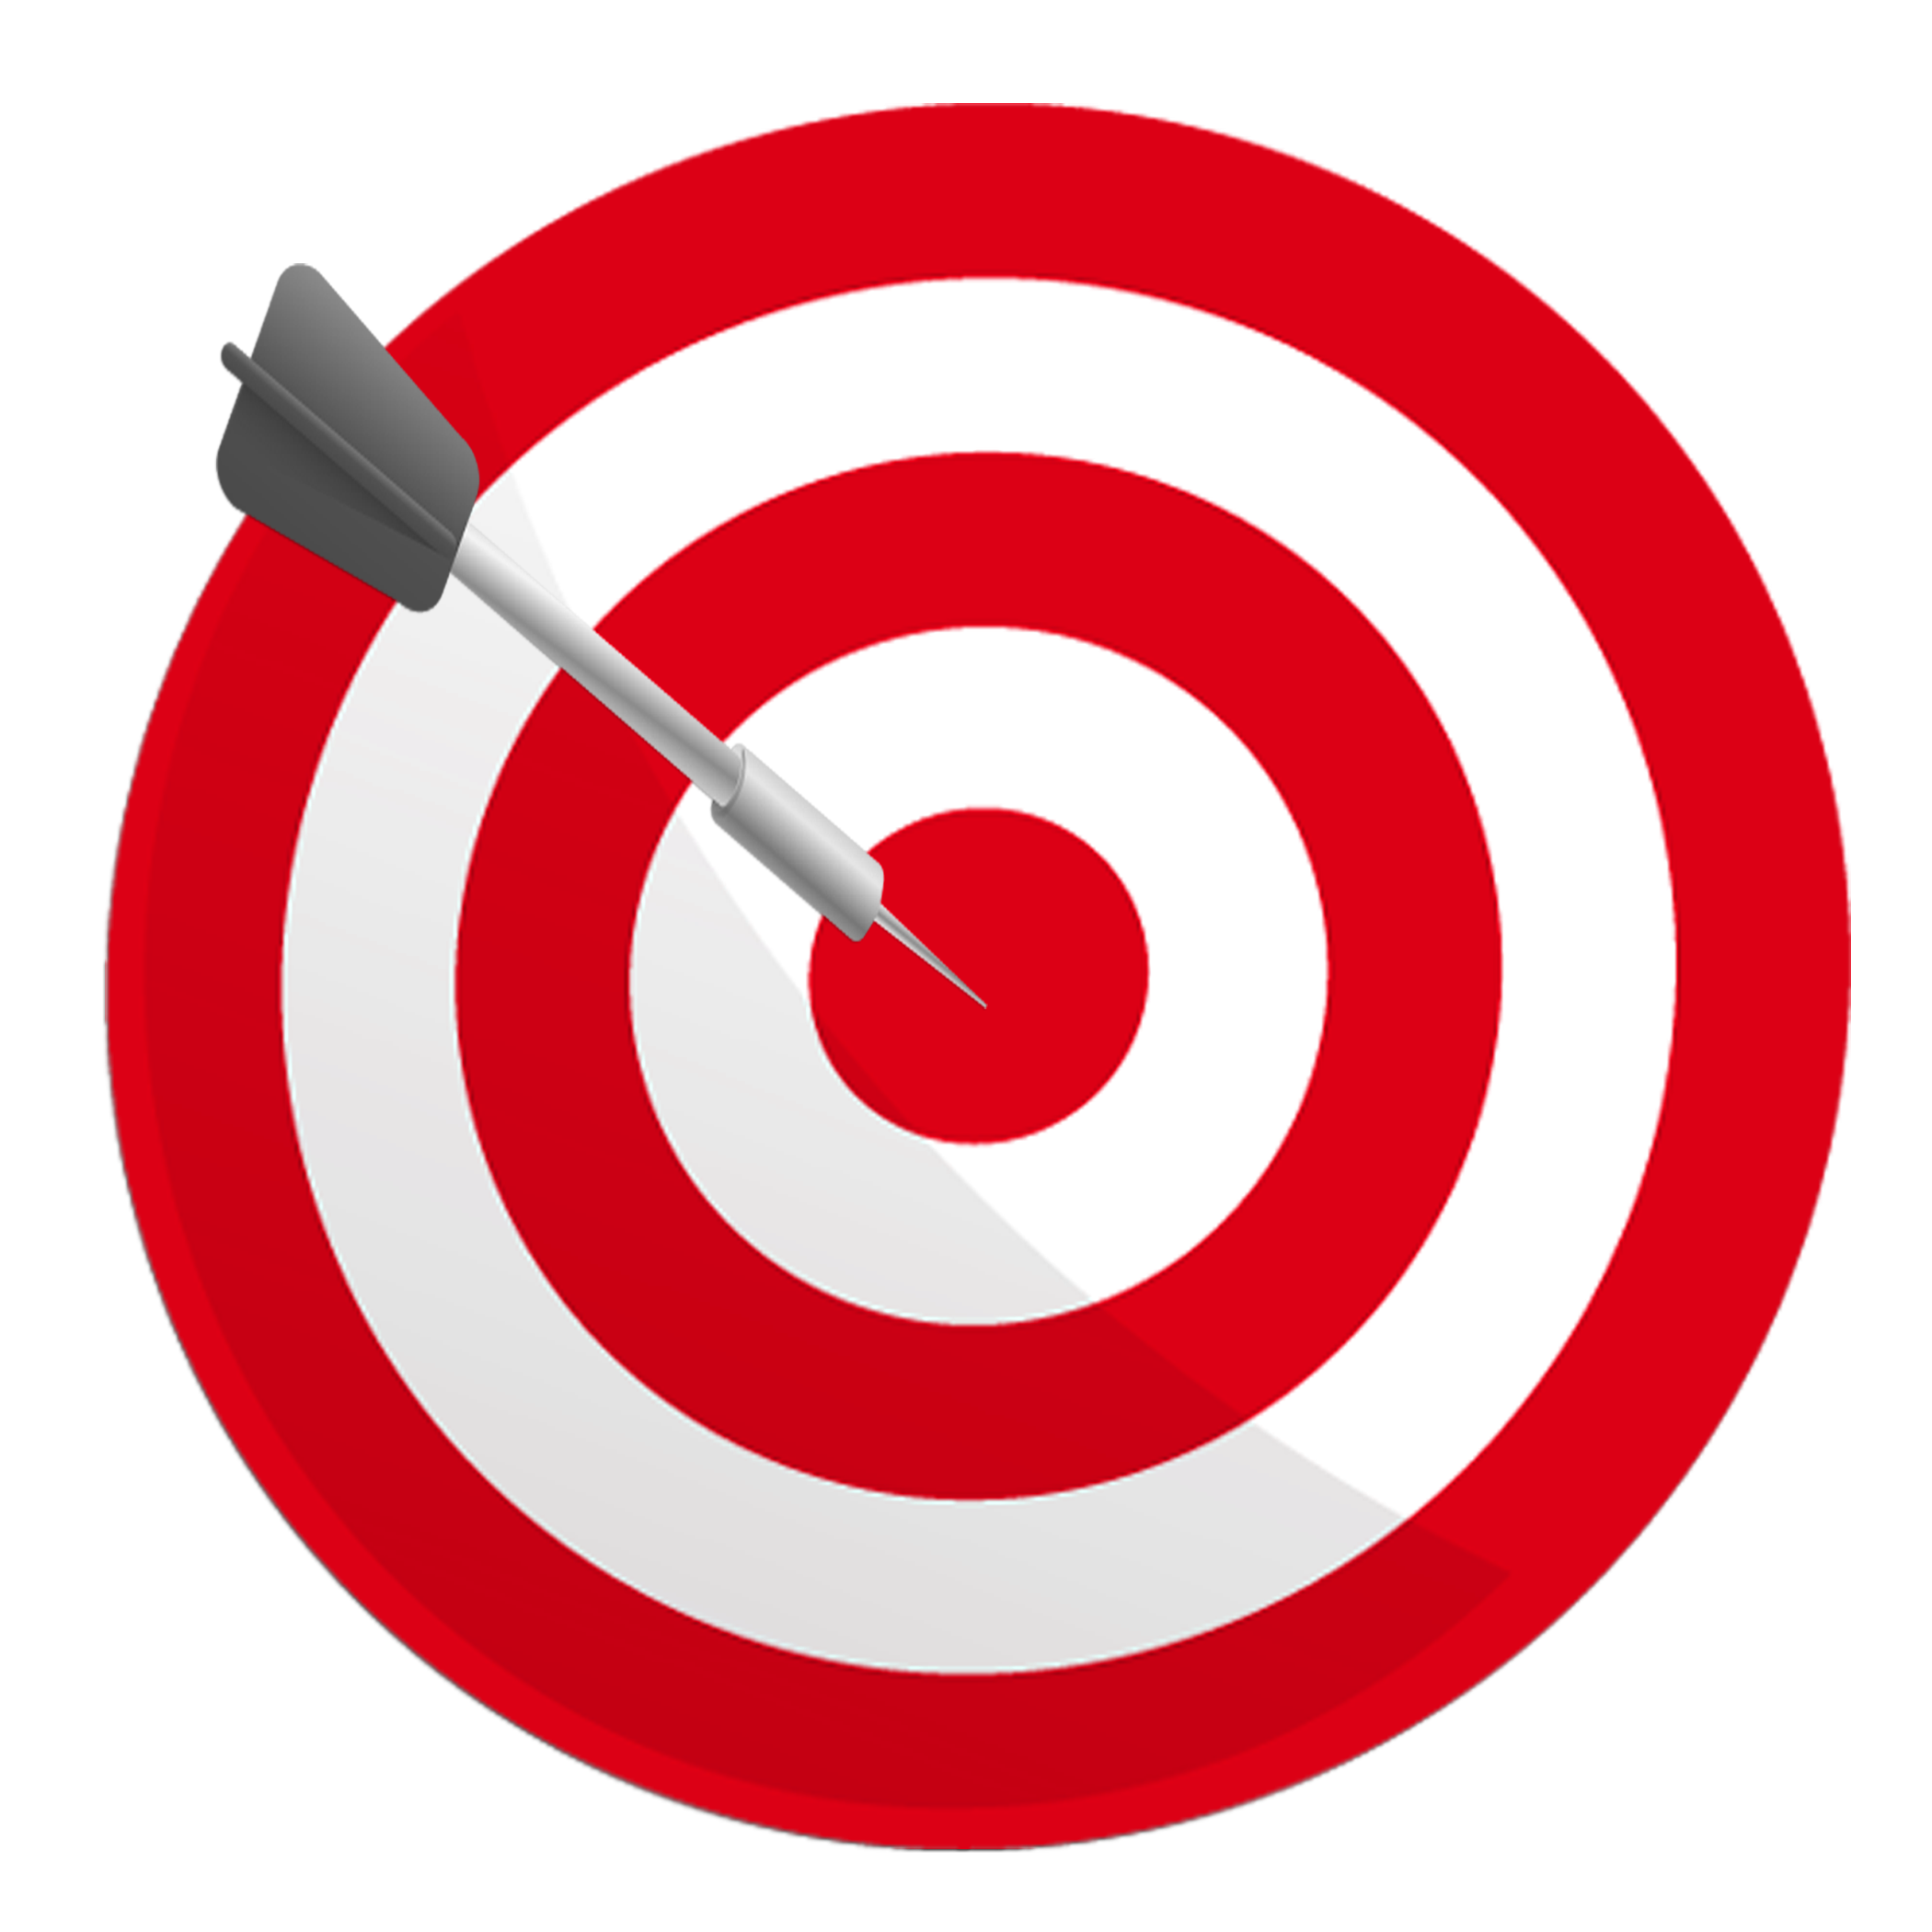 Target Png Transparent Targetpng Images Pluspng